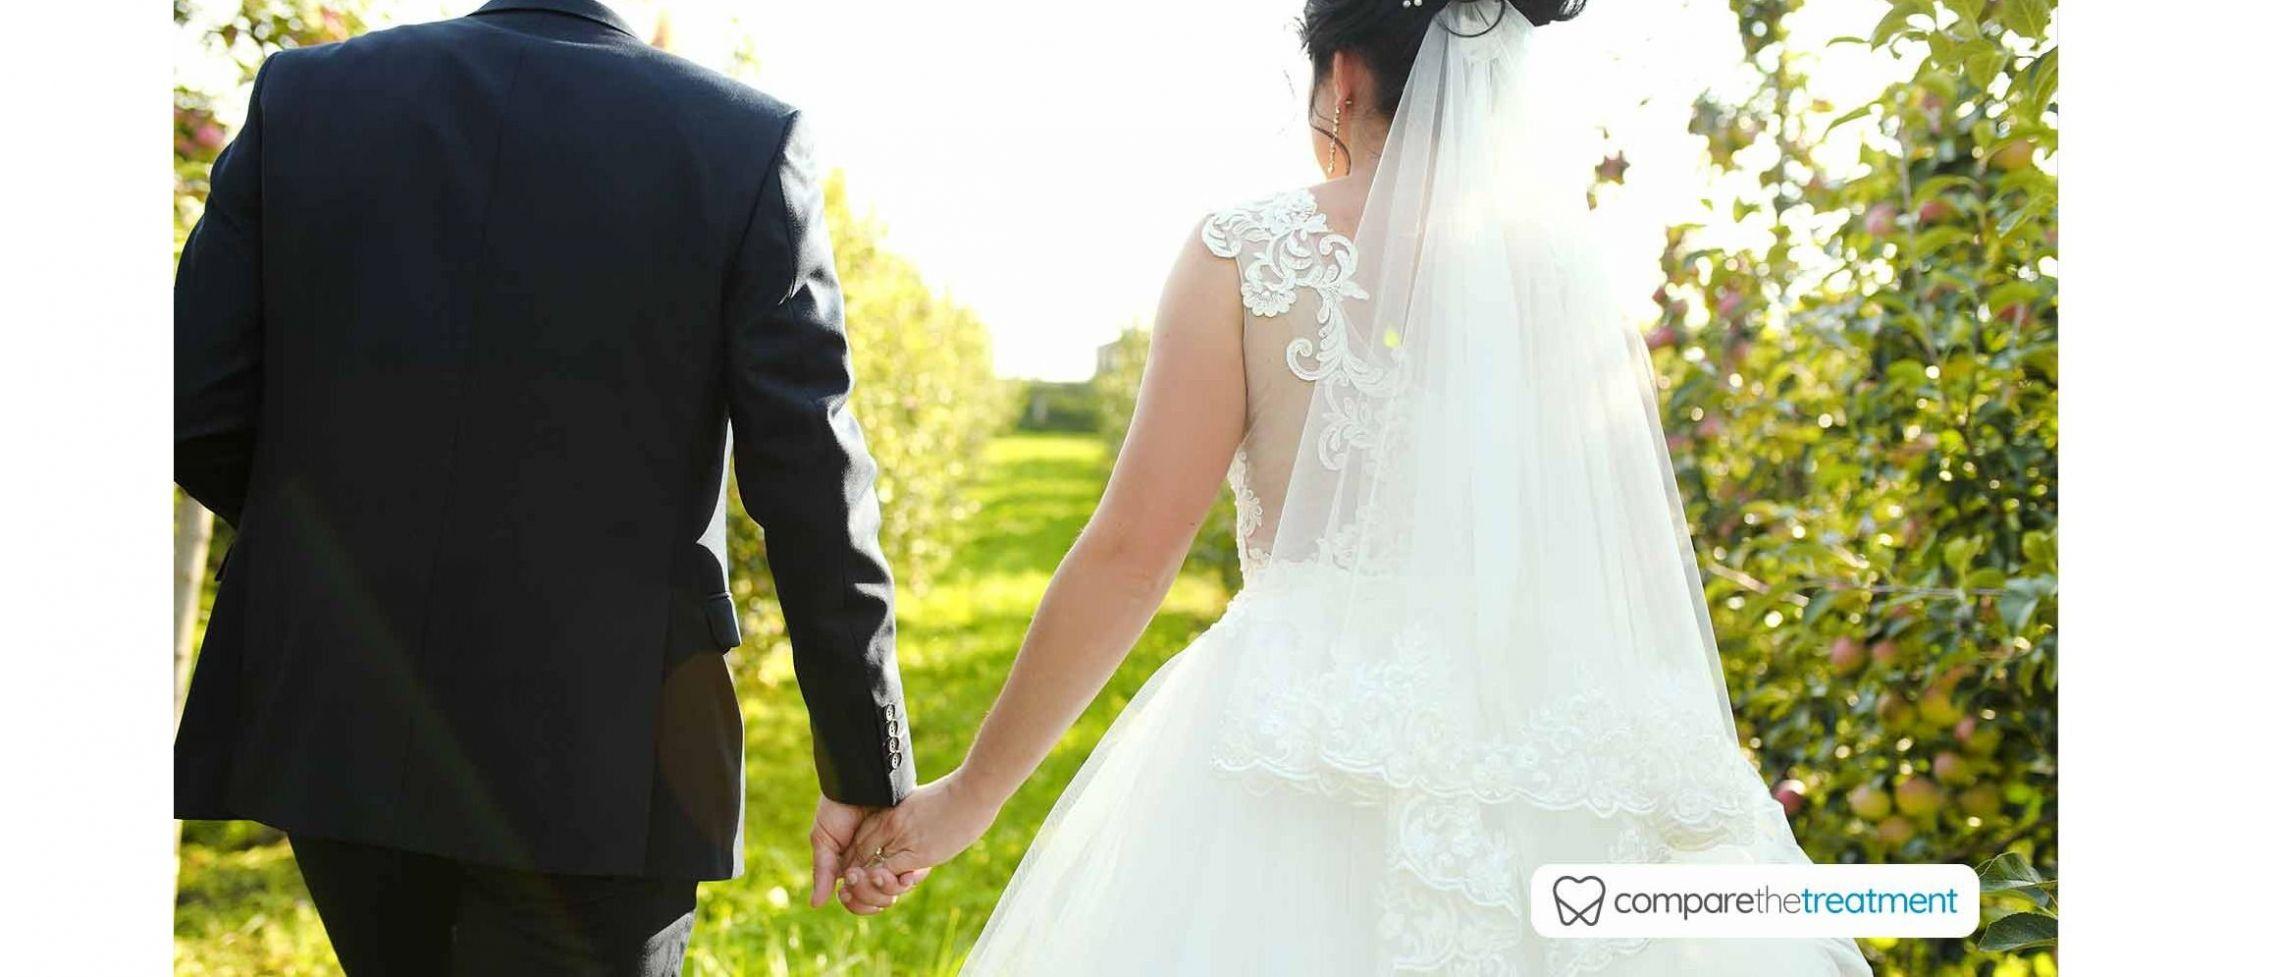 Married at First Sight UK –Nikita demands husband has veneers